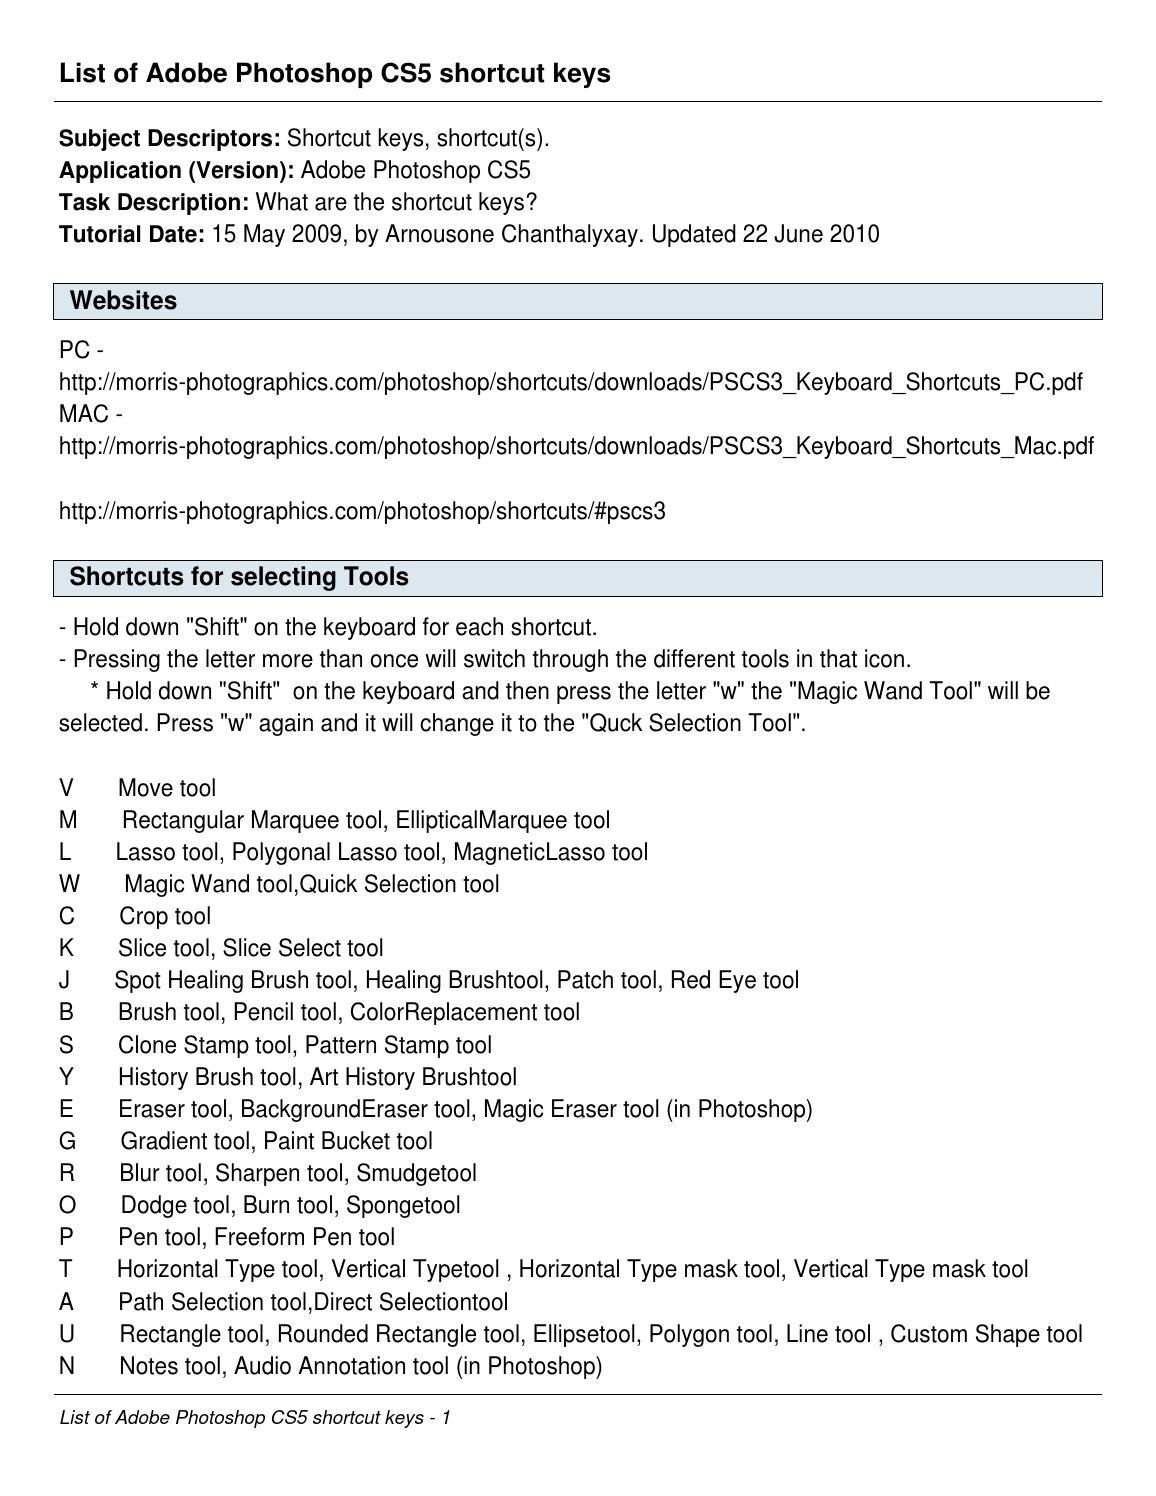 photoshop shortcut keys list in pdf